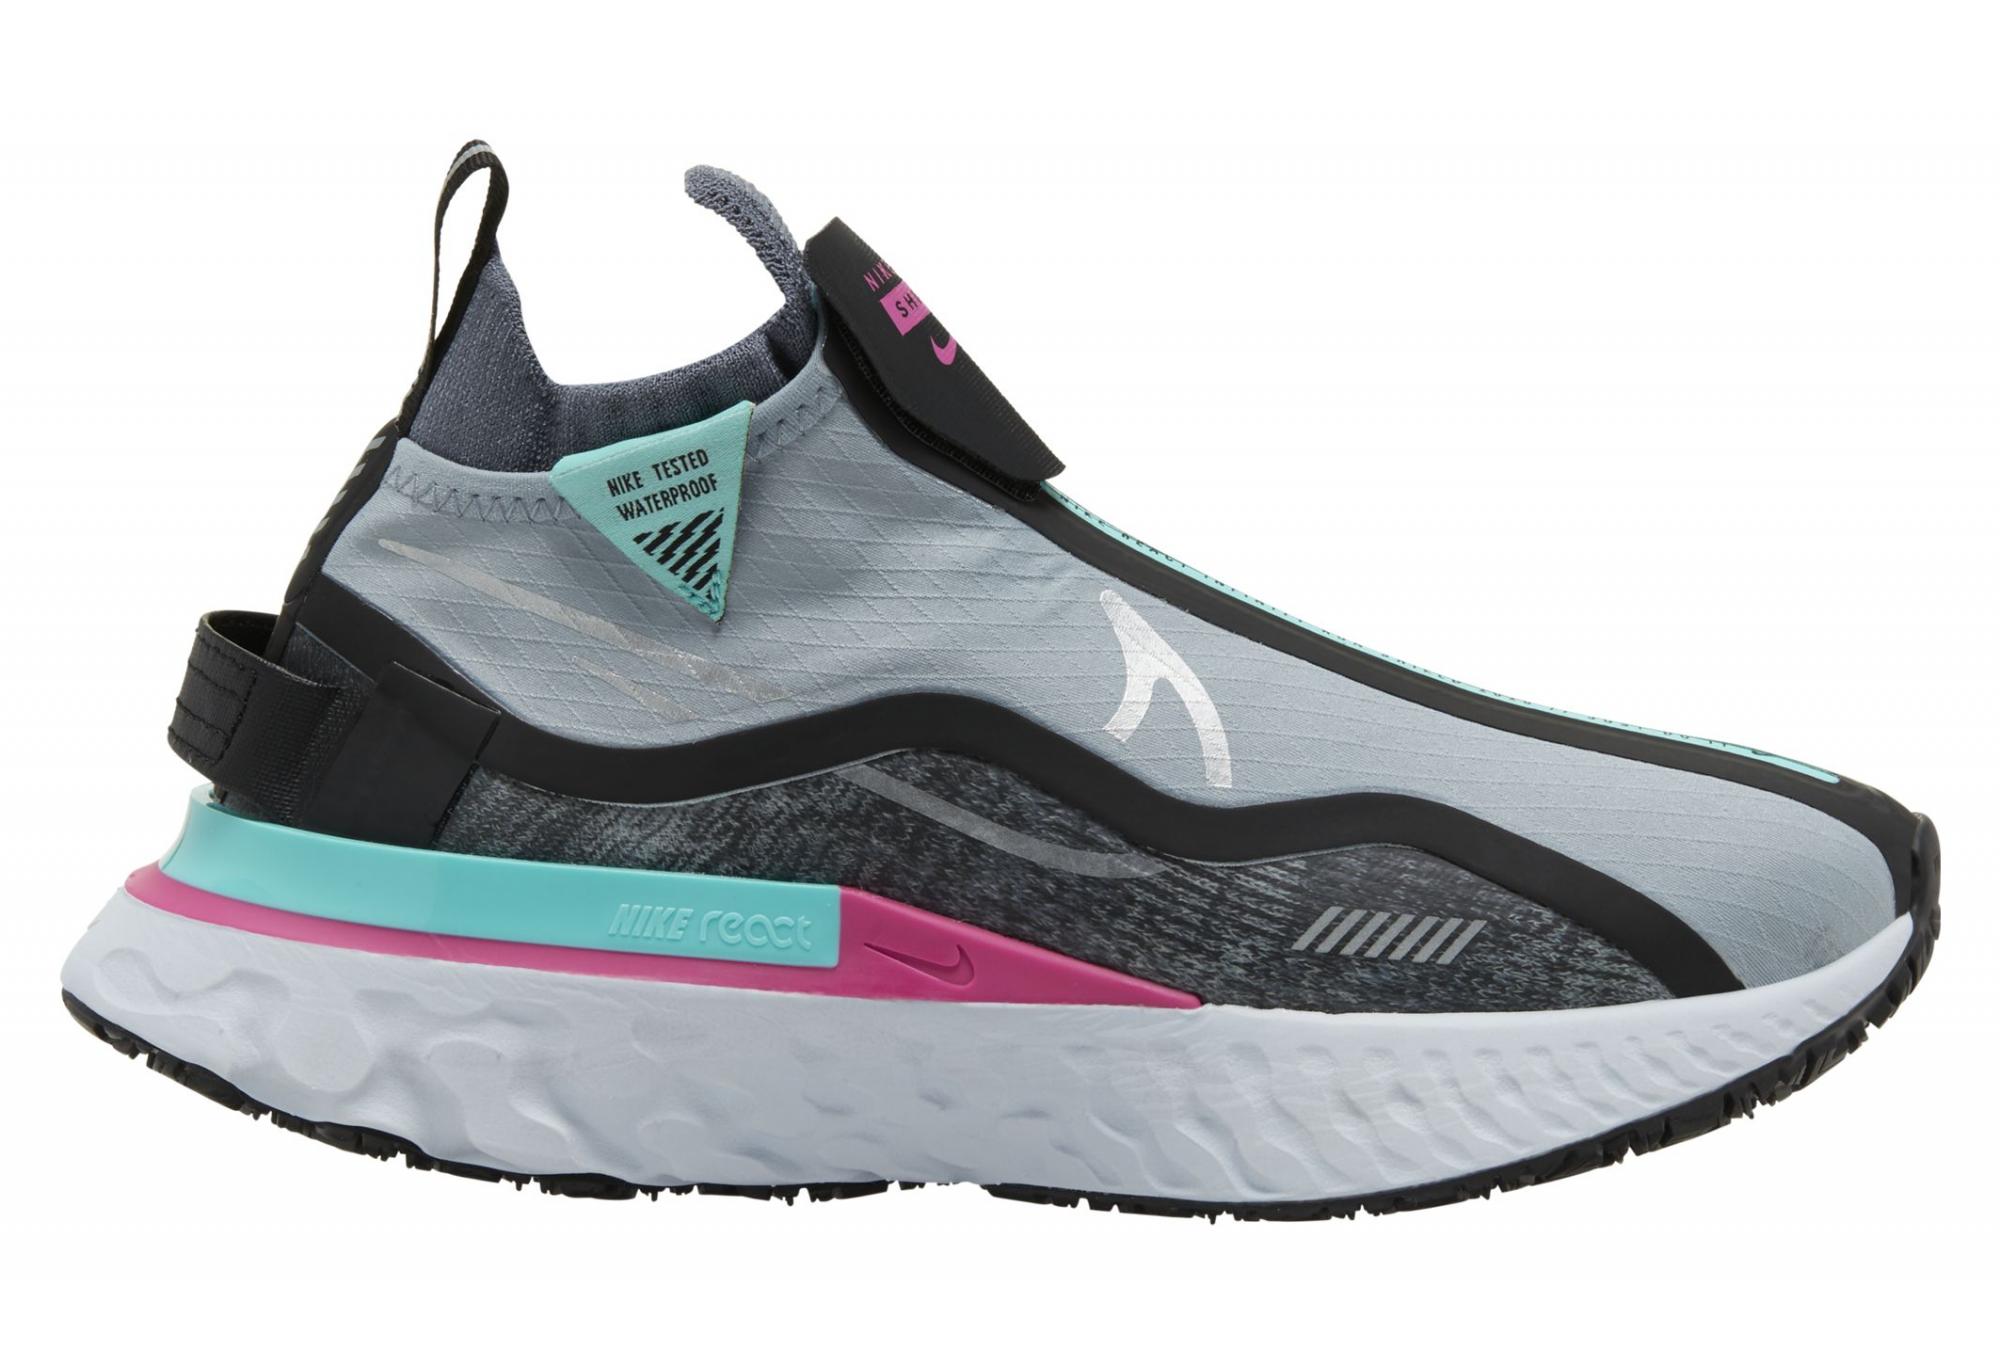 Arqueológico carne Cariñoso  Zapatillas Running Nike React Infinity Run Flyknit Shield Negro Rosado  Mujeres | Alltricks.es